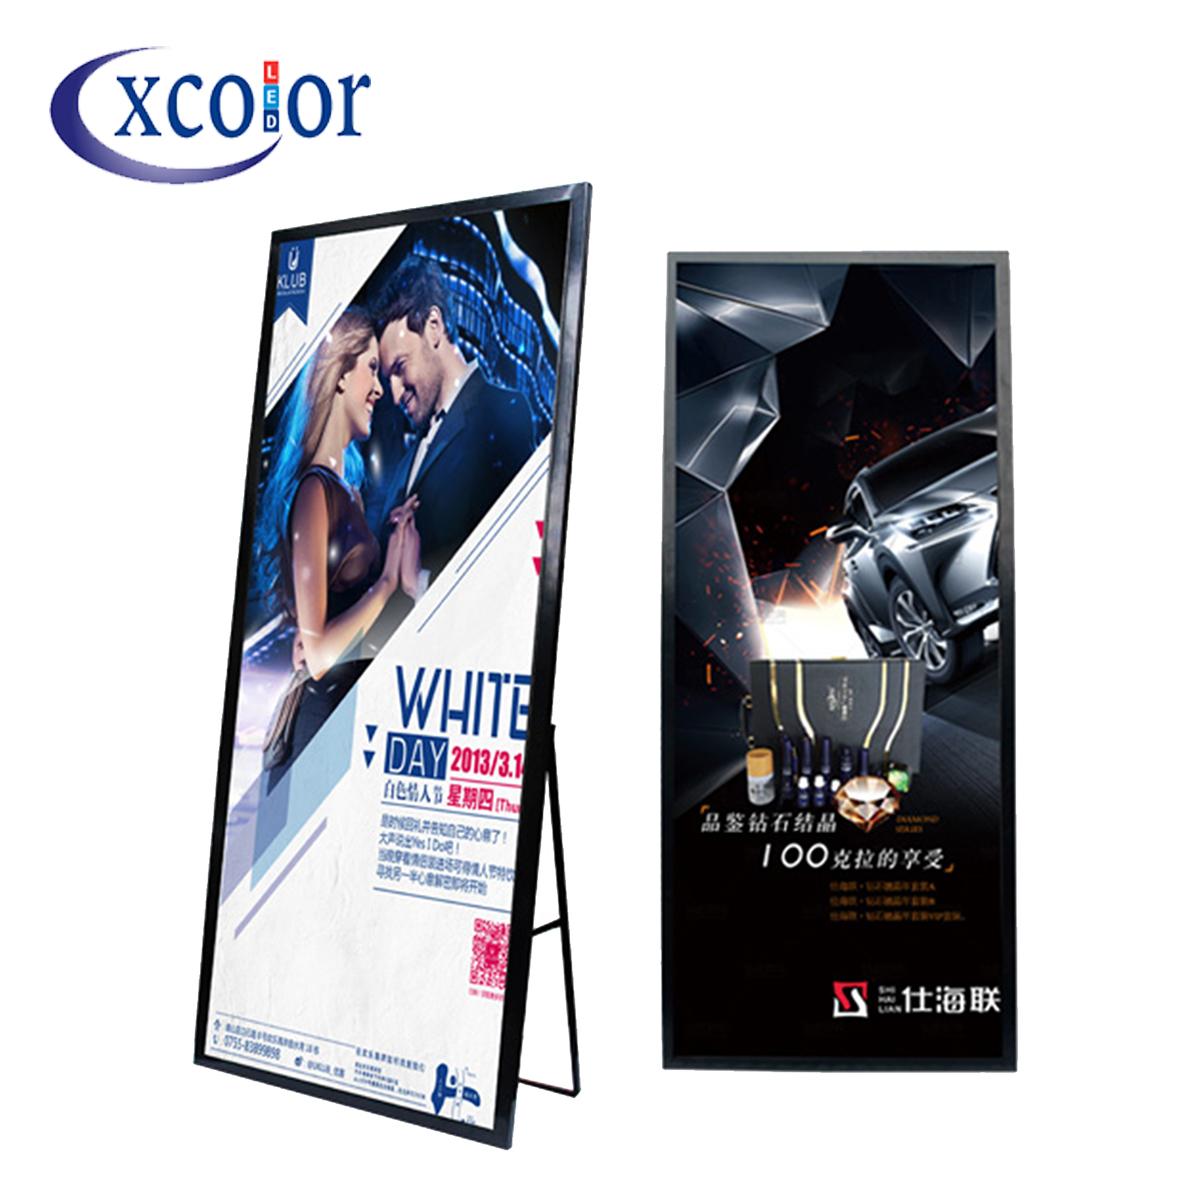 Custom Indoor P2 5 Led Smd Module Led Standee Display Price - Buy Led  Standee Display,Led Smd Module Display,Indoor Led Display Product on  Alibaba com